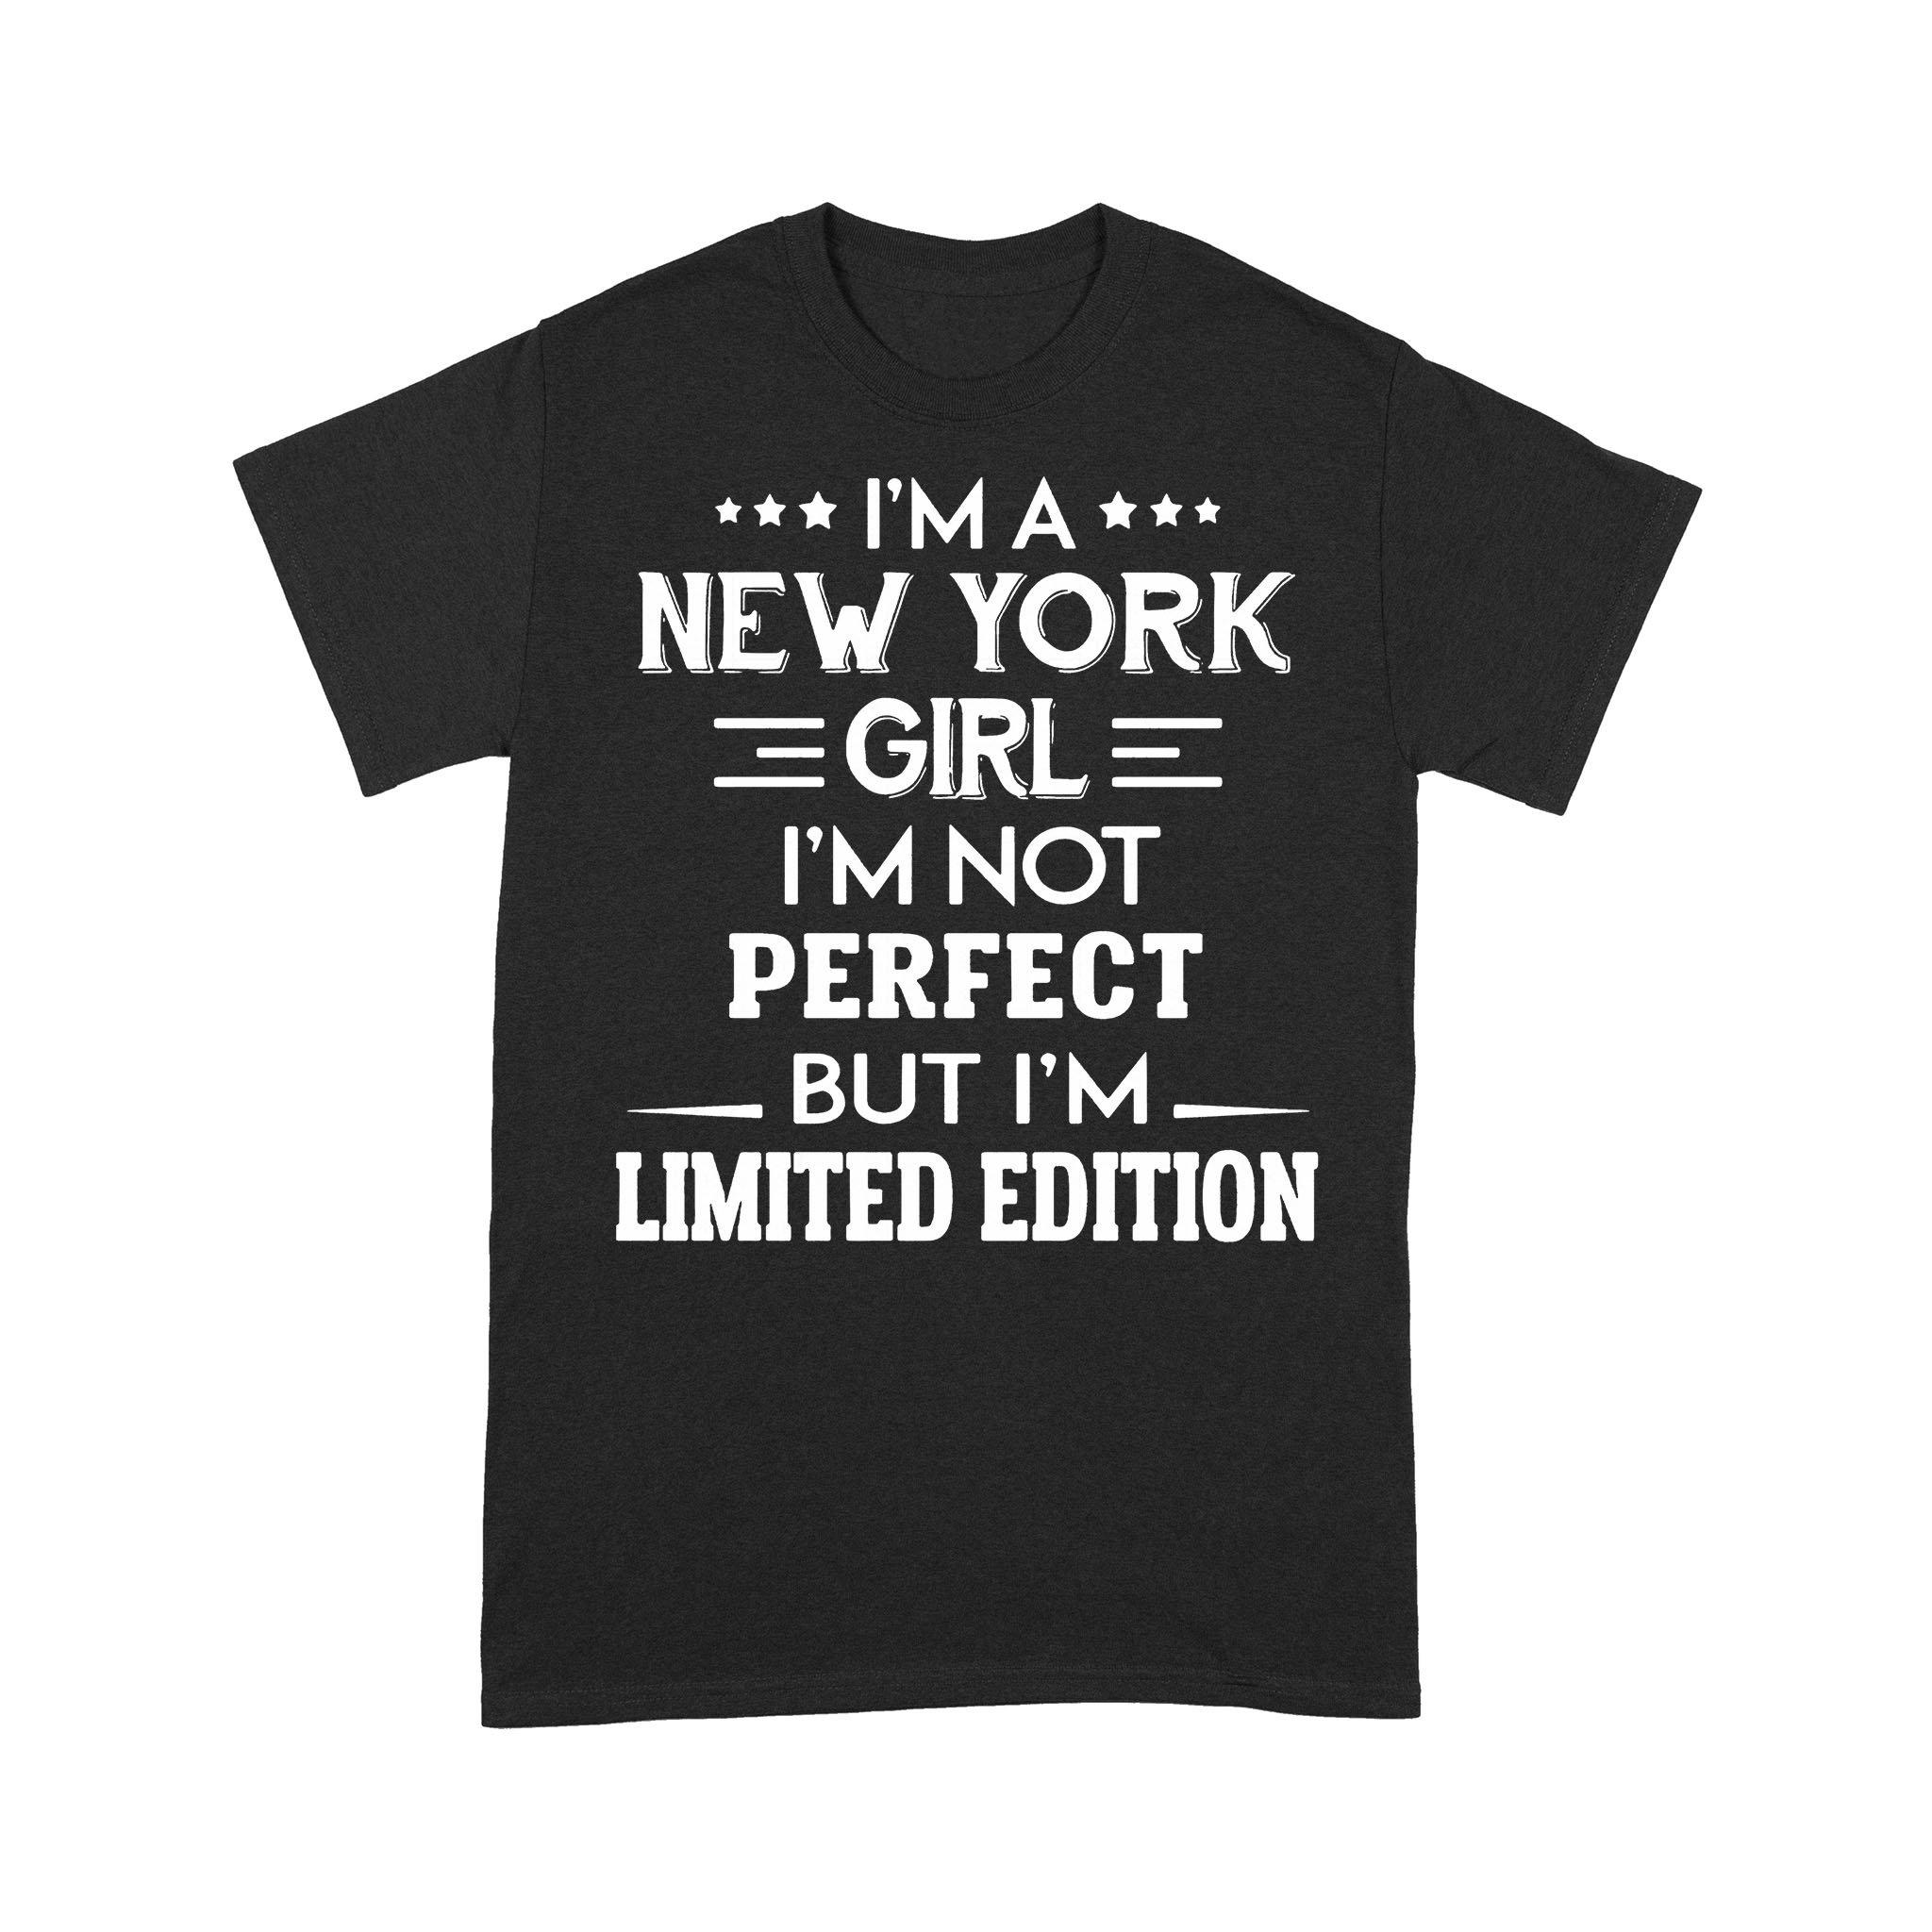 I'm A New York Girl I'm Not Perfect But I'm Limited Edition T-shirt